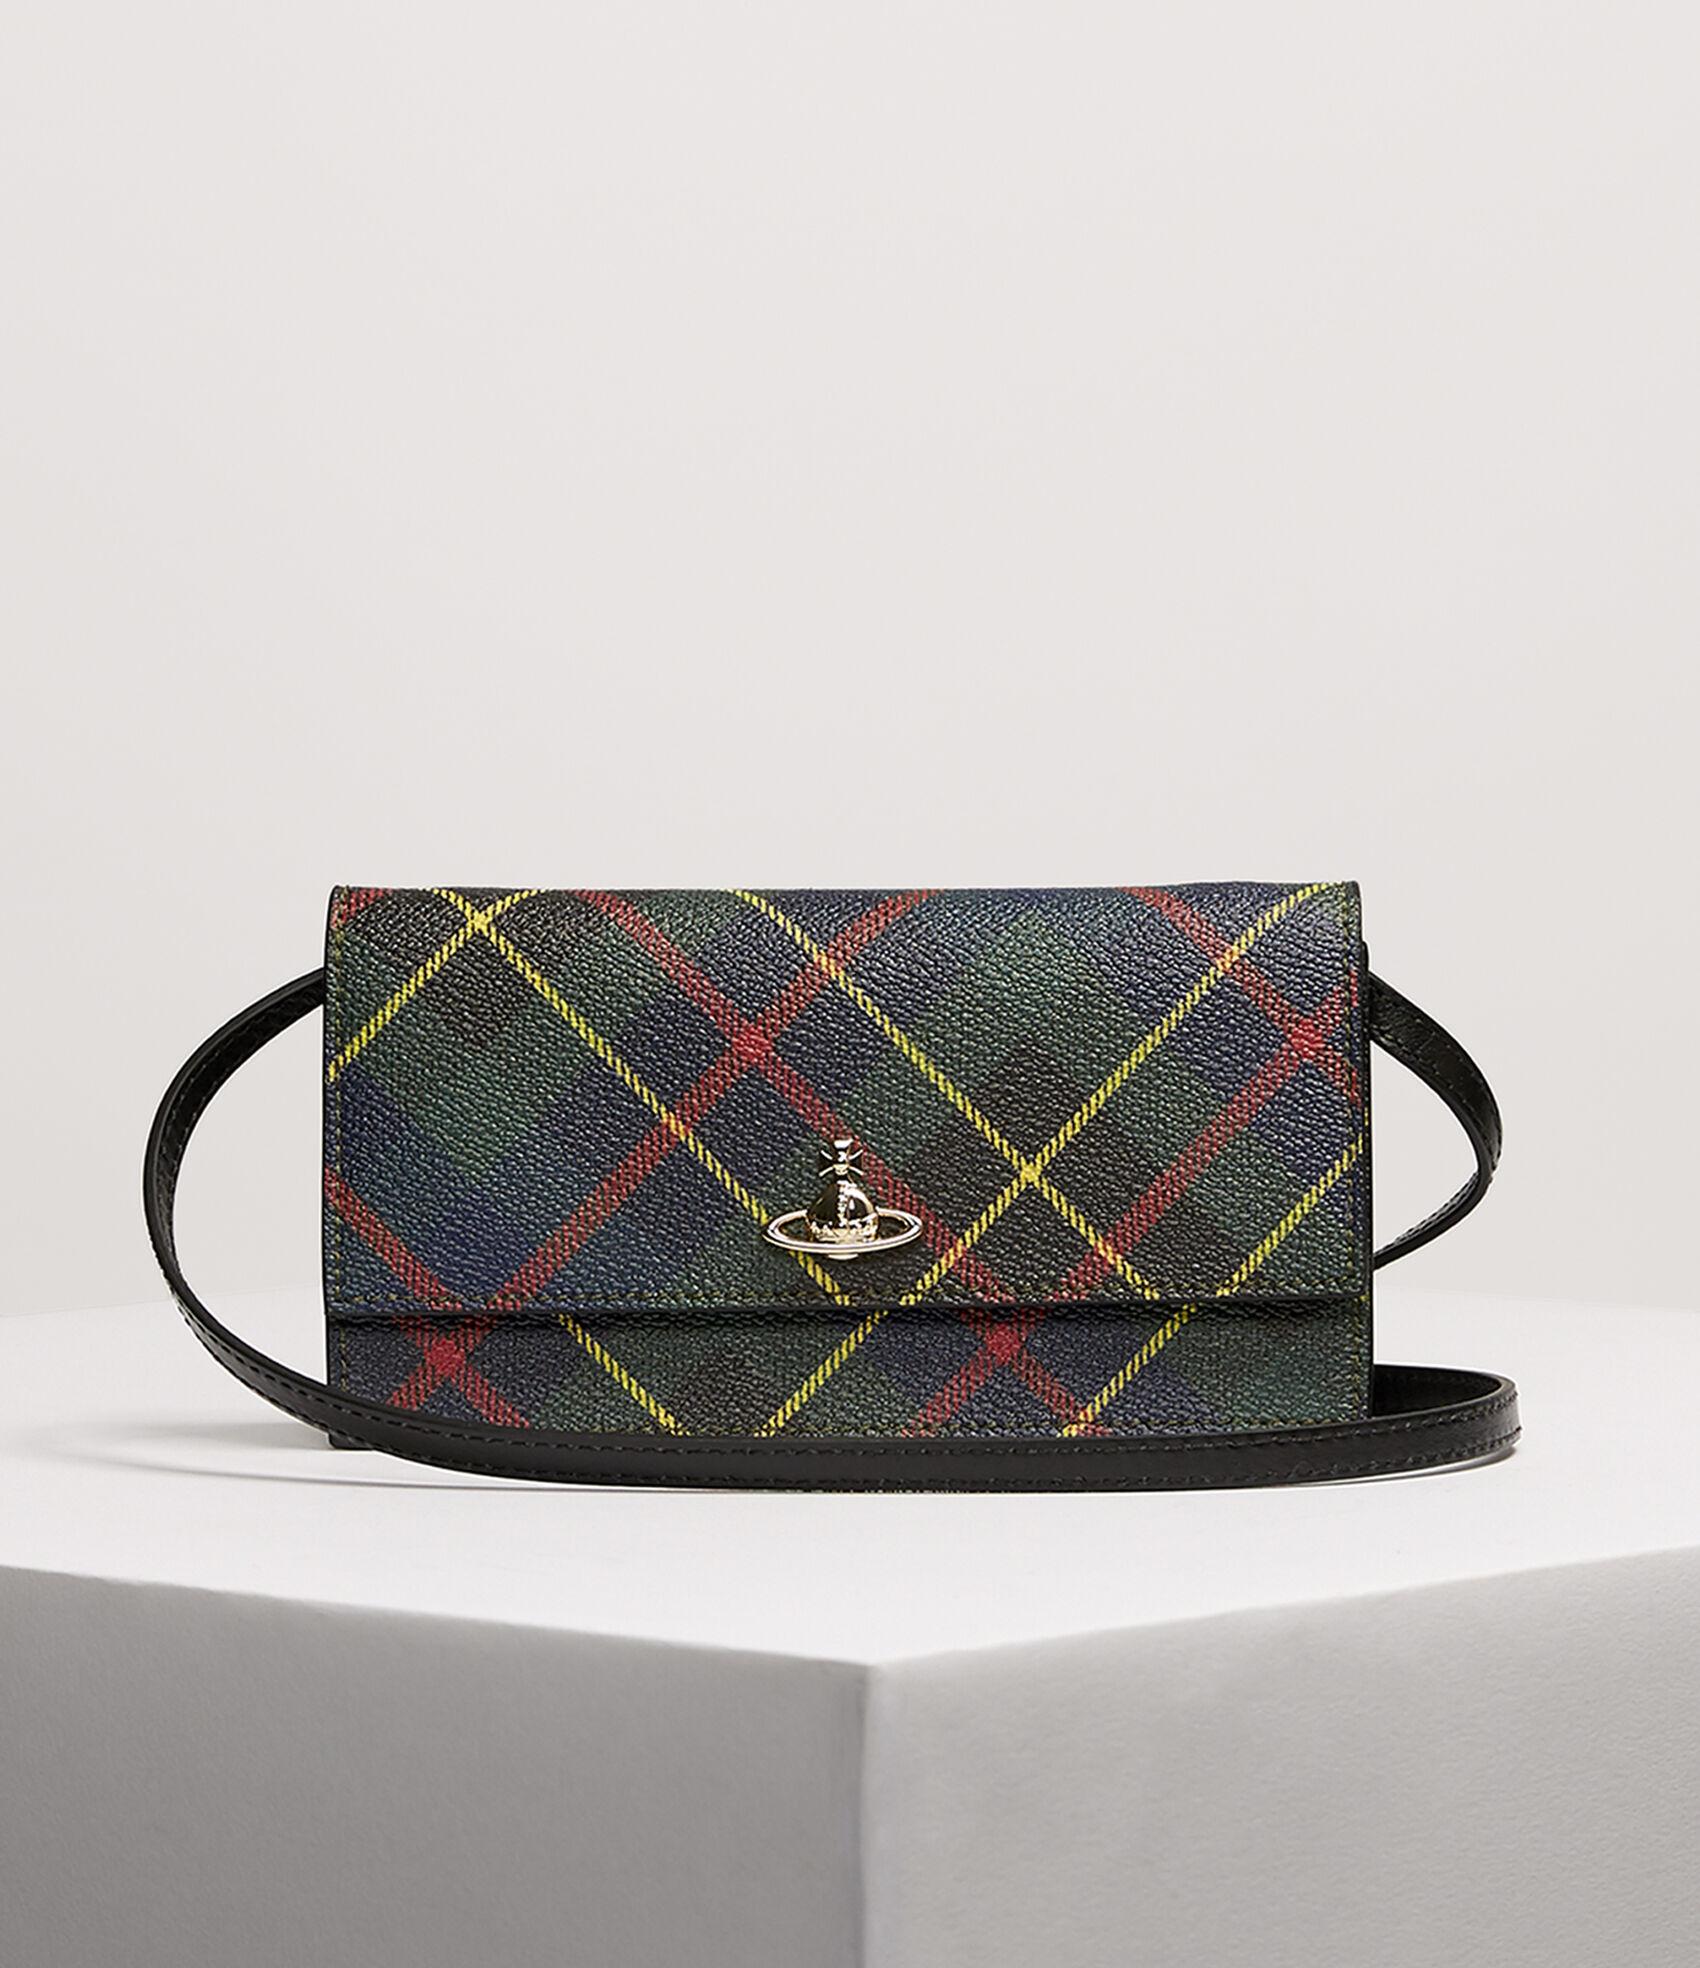 9d3c758a03 Vivienne Westwood Women's Designer Crossbody Bags | Women's ...